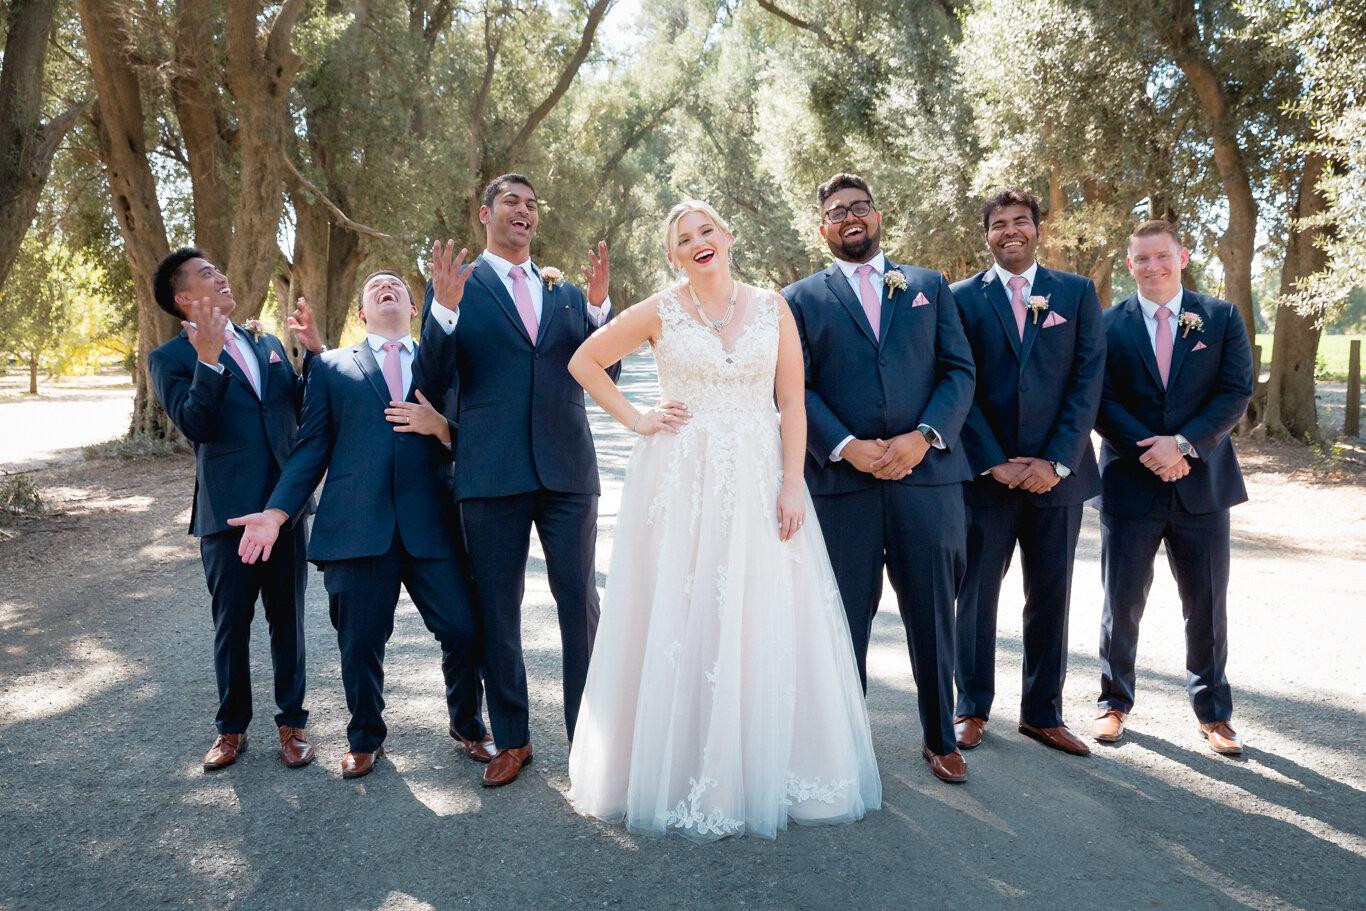 2019.08.24_Emily-Ashir-Wedding-at-the-Maples-5327.jpg